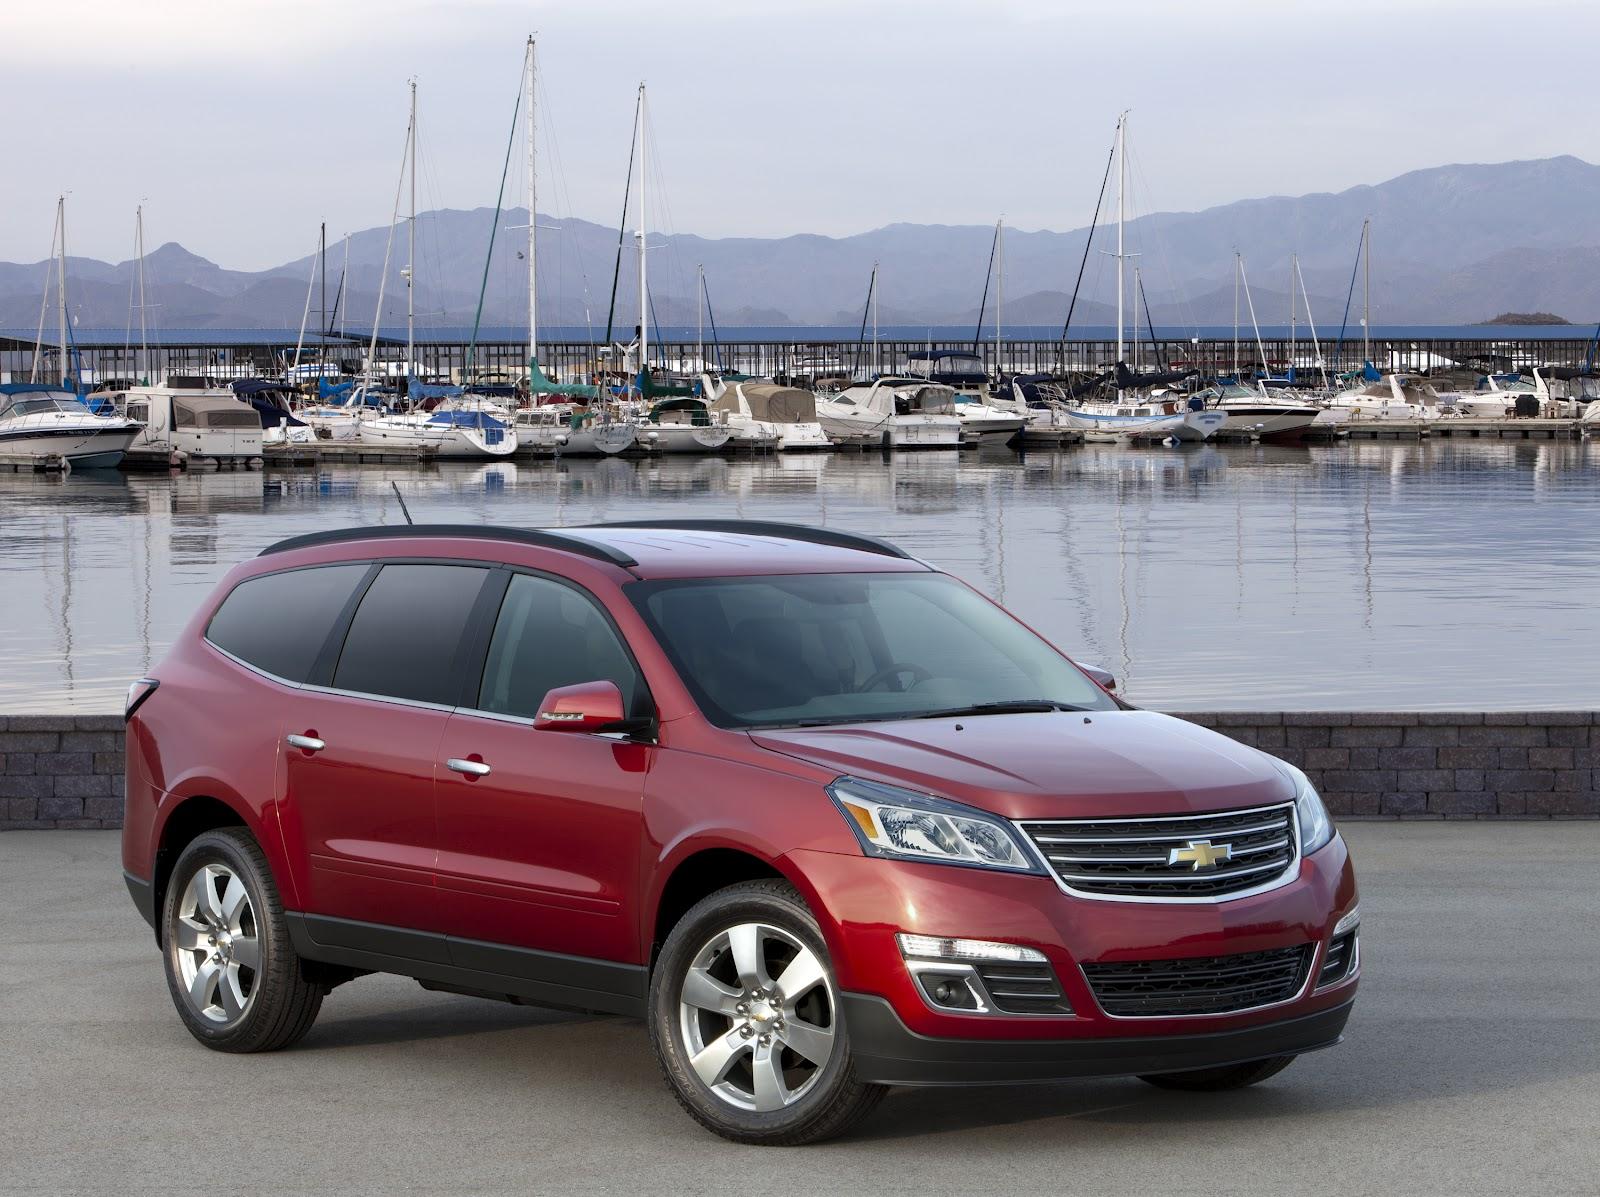 chevrolet - 2009 - [Chevrolet] traverse 2013+chevrolet+traverse+3